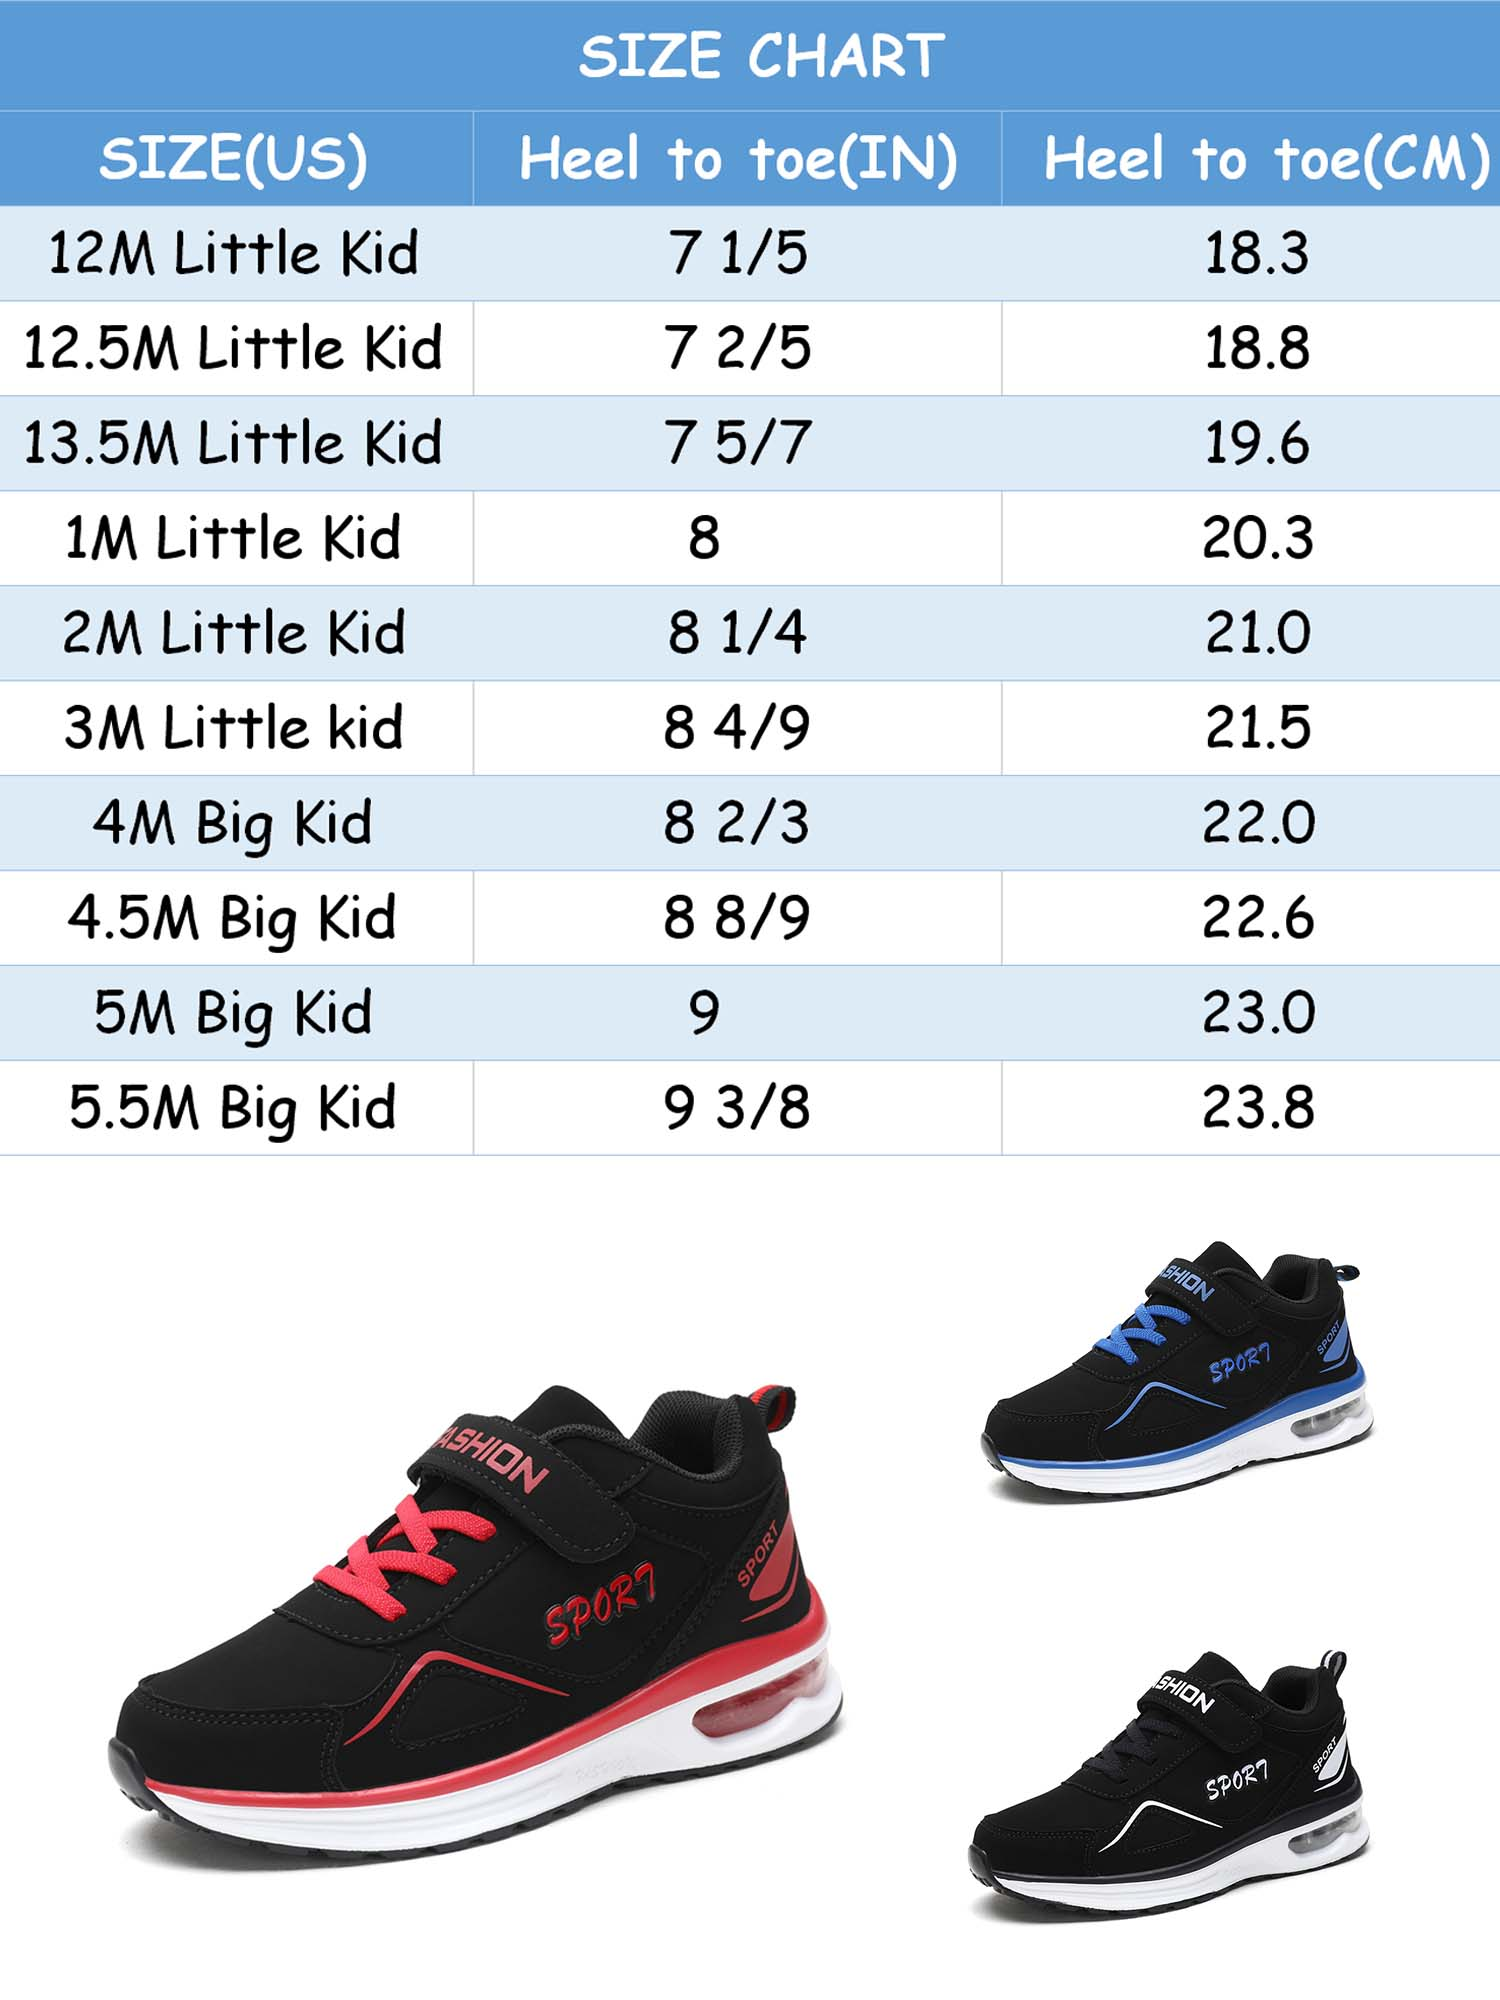 4m us big kid shoe size